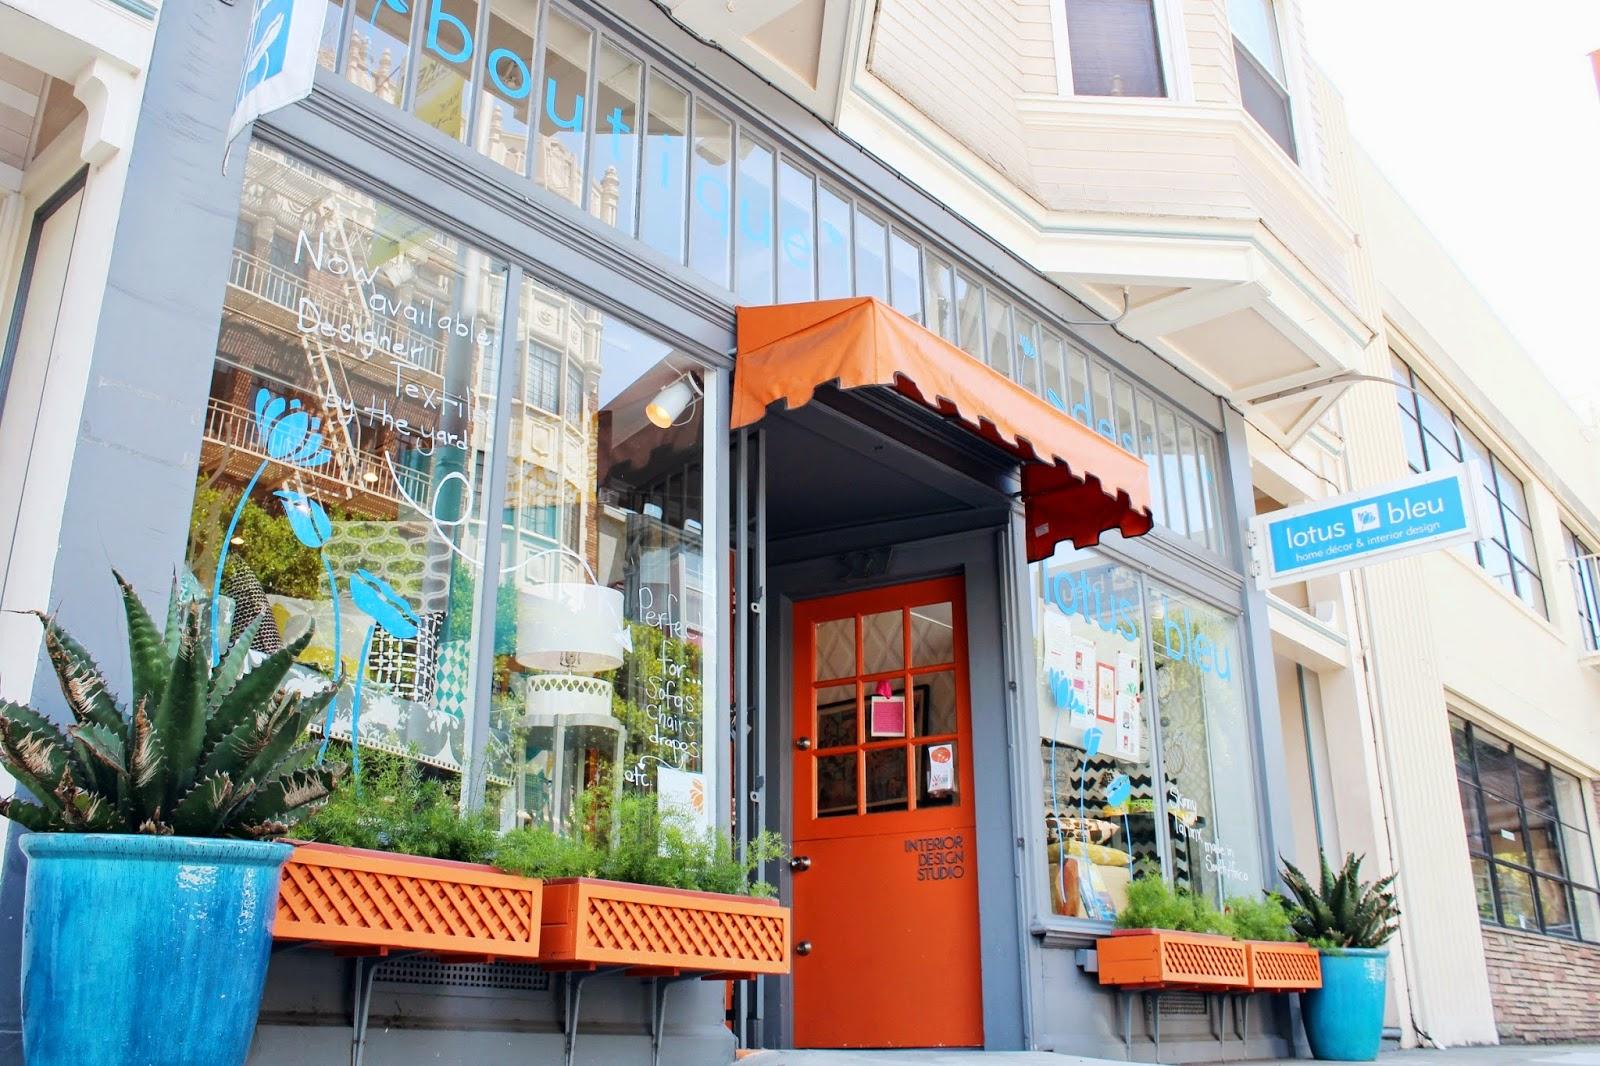 Lotus Bleu San Francisco Hayes Street home furnishings decor shop